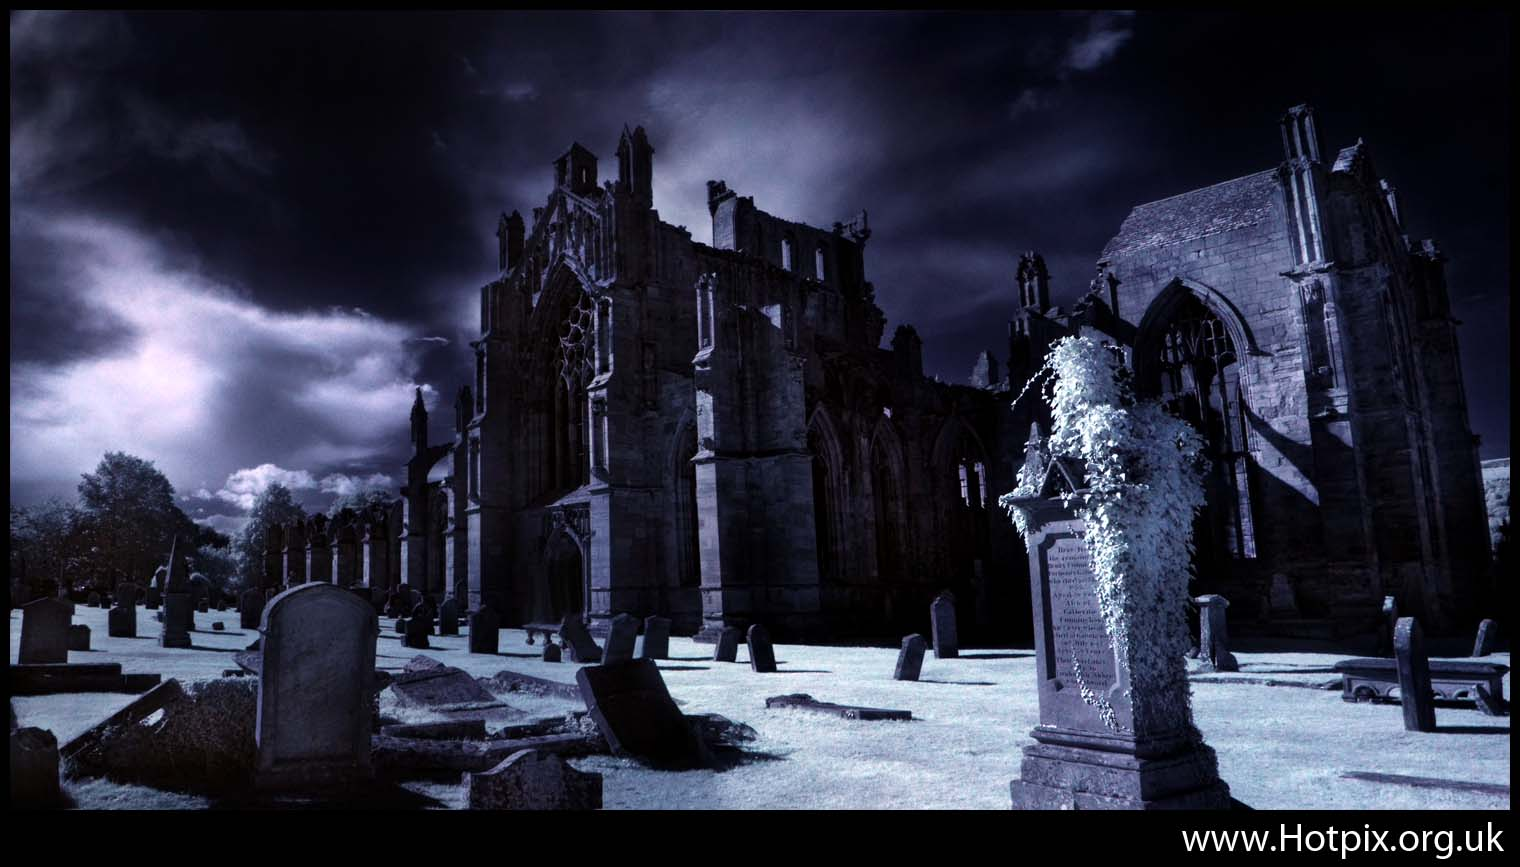 infrared,infra,red,b/w,mono,monochrome,scottish,border infrared,borders,UK,scotland,blue,toned,R72,filter,Hoya,tony,smith,tonysmith,hotpix,tonysmithhotpix,hotpics,hot,pix,pics,picks,hotpicks,music,HDR,digital,IR,digitalIR,landscape,church,building,spooky,mystery,mysterious,night,TheUnforgettablePictures,cool,tonesmith,tone,#tonysmithotpix